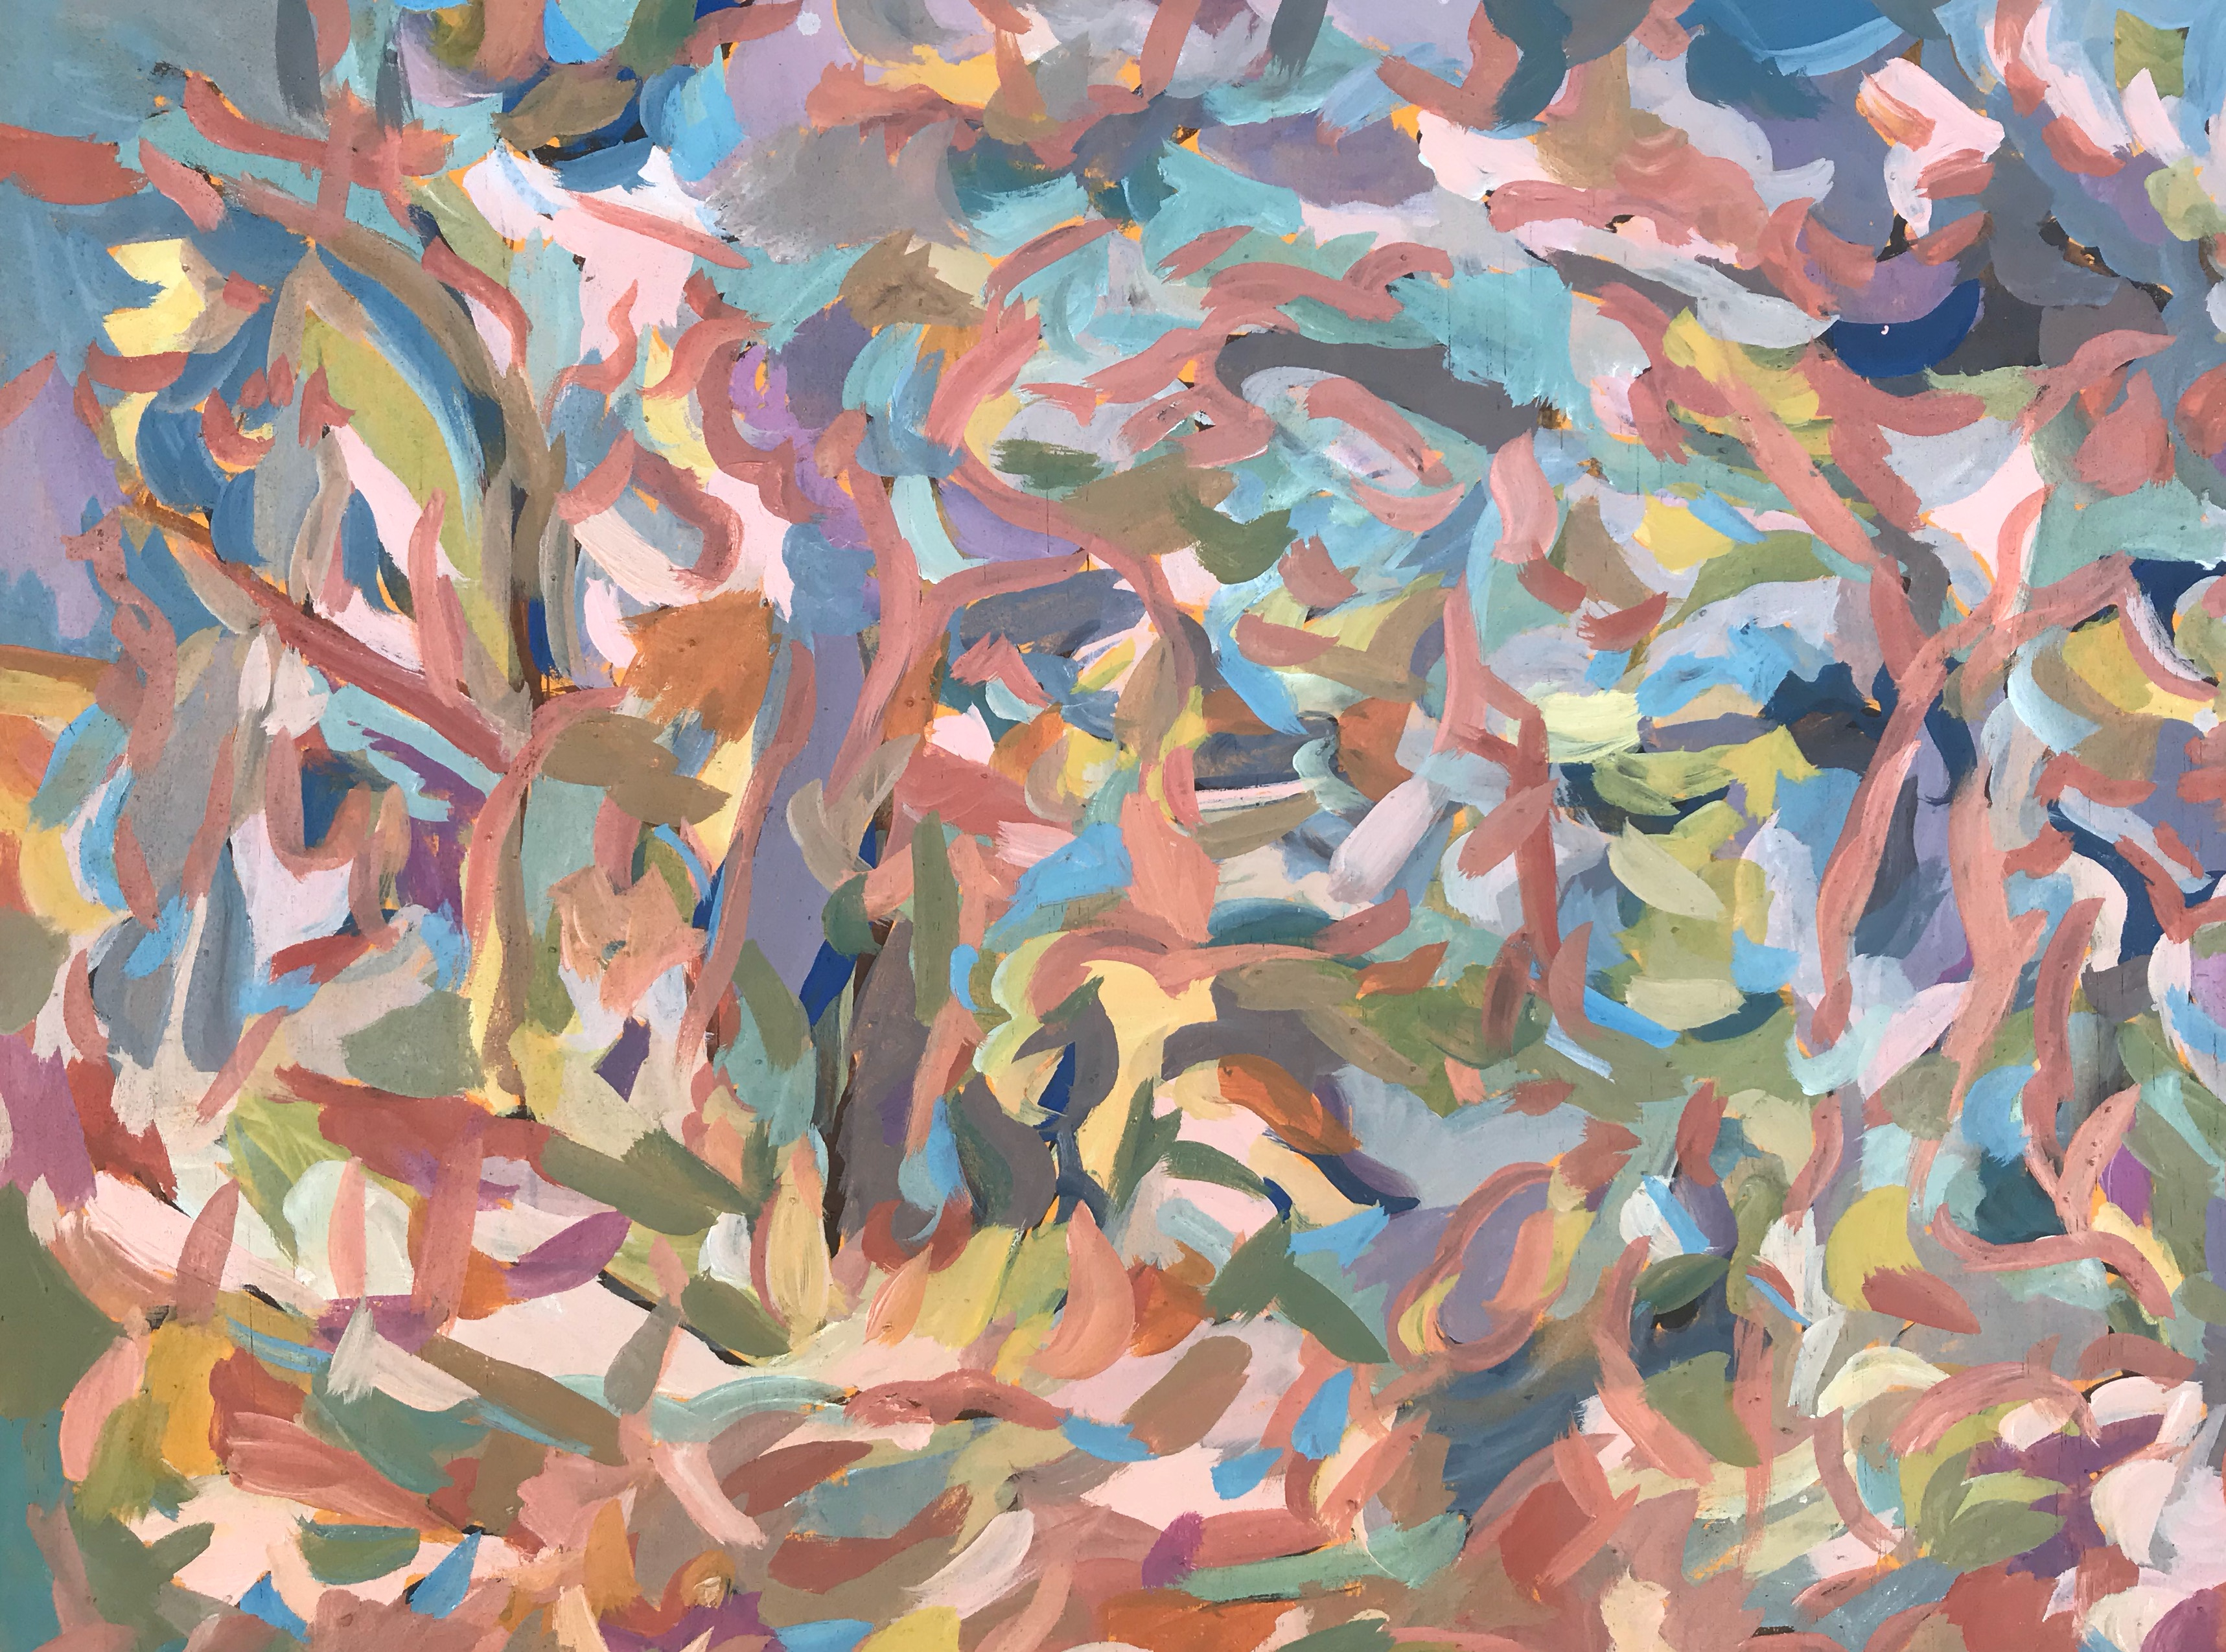 Summer 3 Lorna Grear 30 x 40 cm, 2018